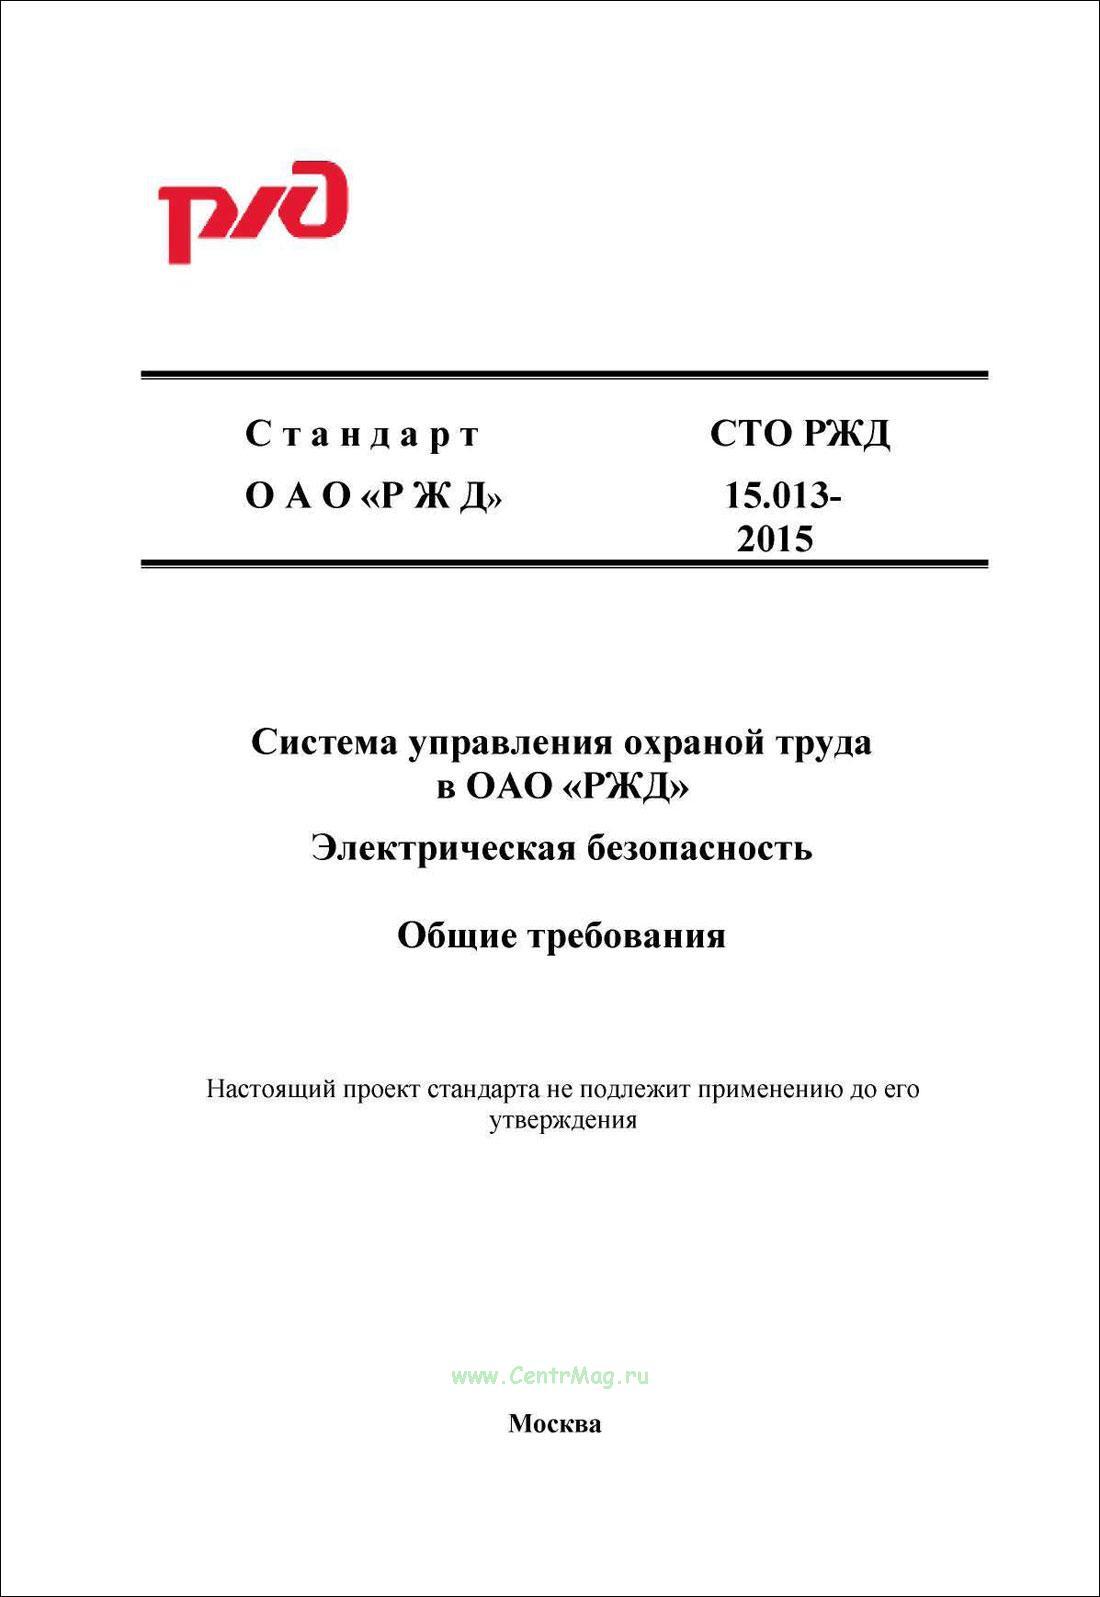 Стандарт по электробезопасности оао ржд свидетельство группа электробезопасности